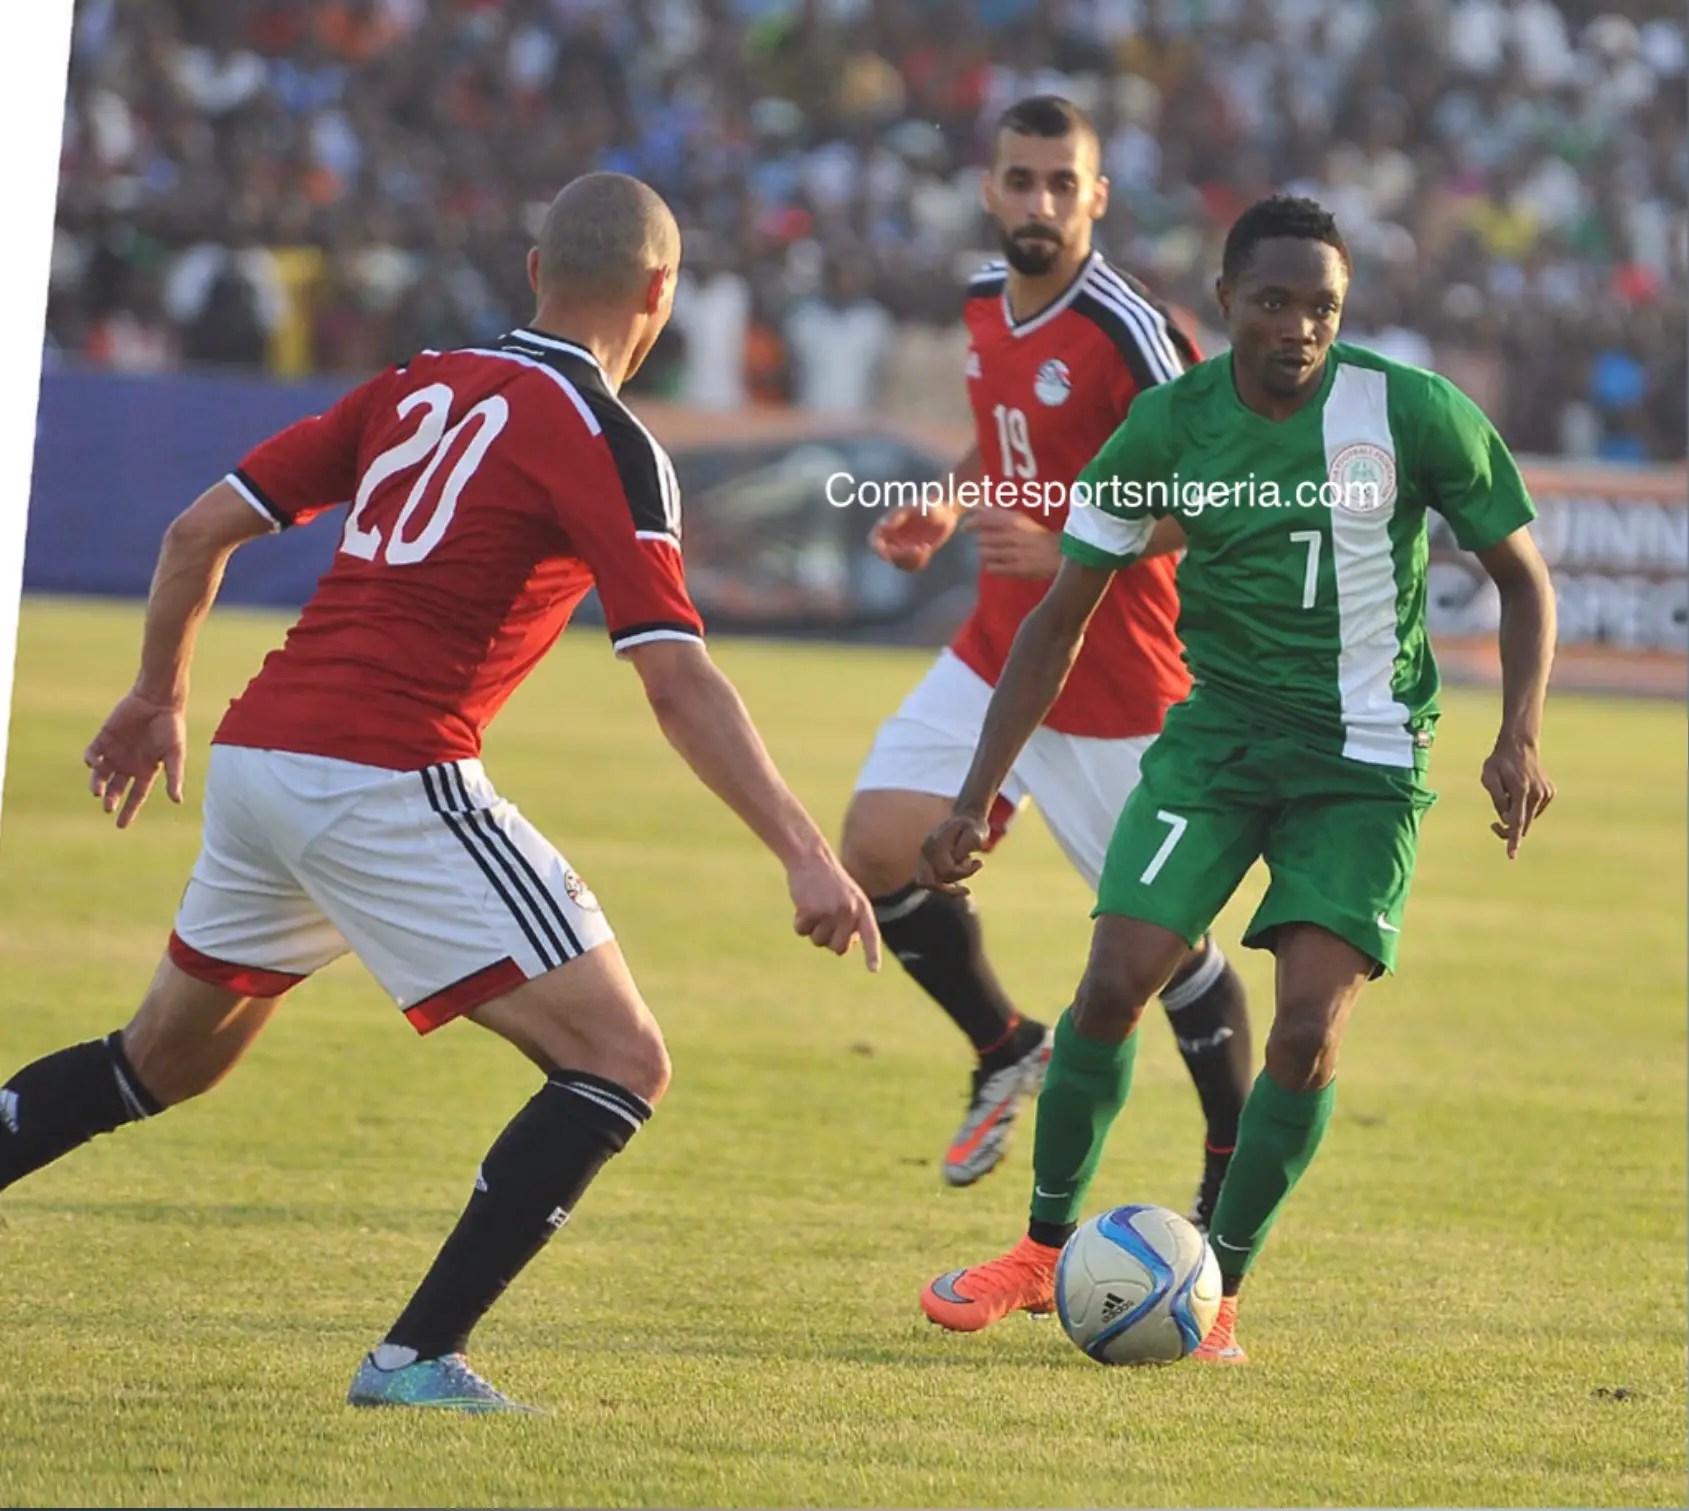 AFCON Miss: Eagles Beg Nigerians As NFF Plan World Cup Friendlies